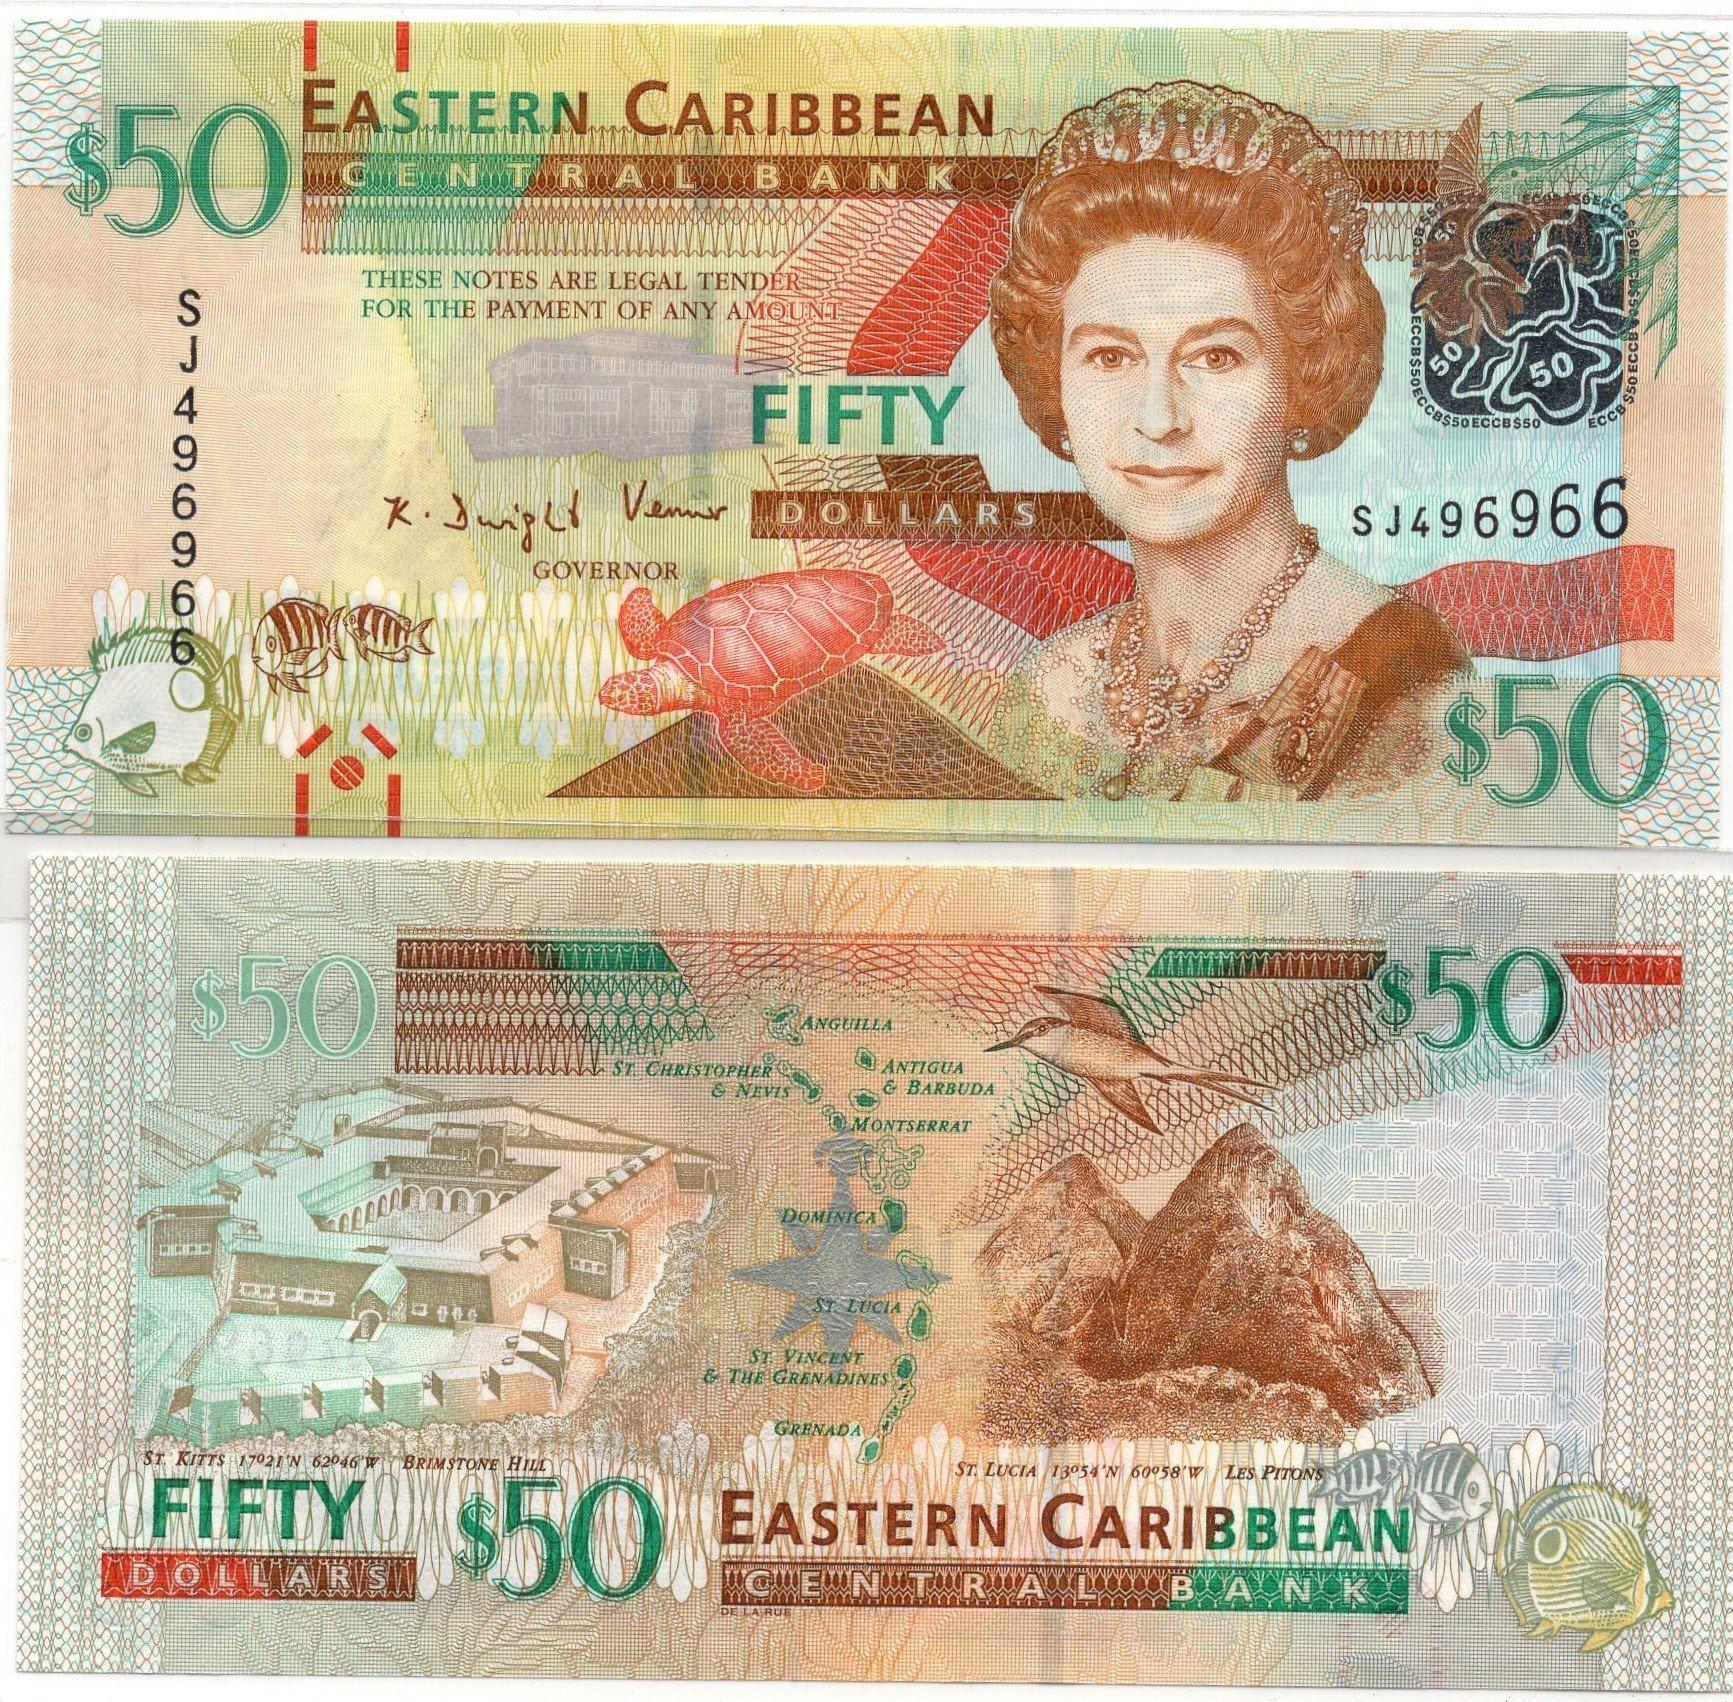 Eastern caribbean 50 dollars 2016 for sale